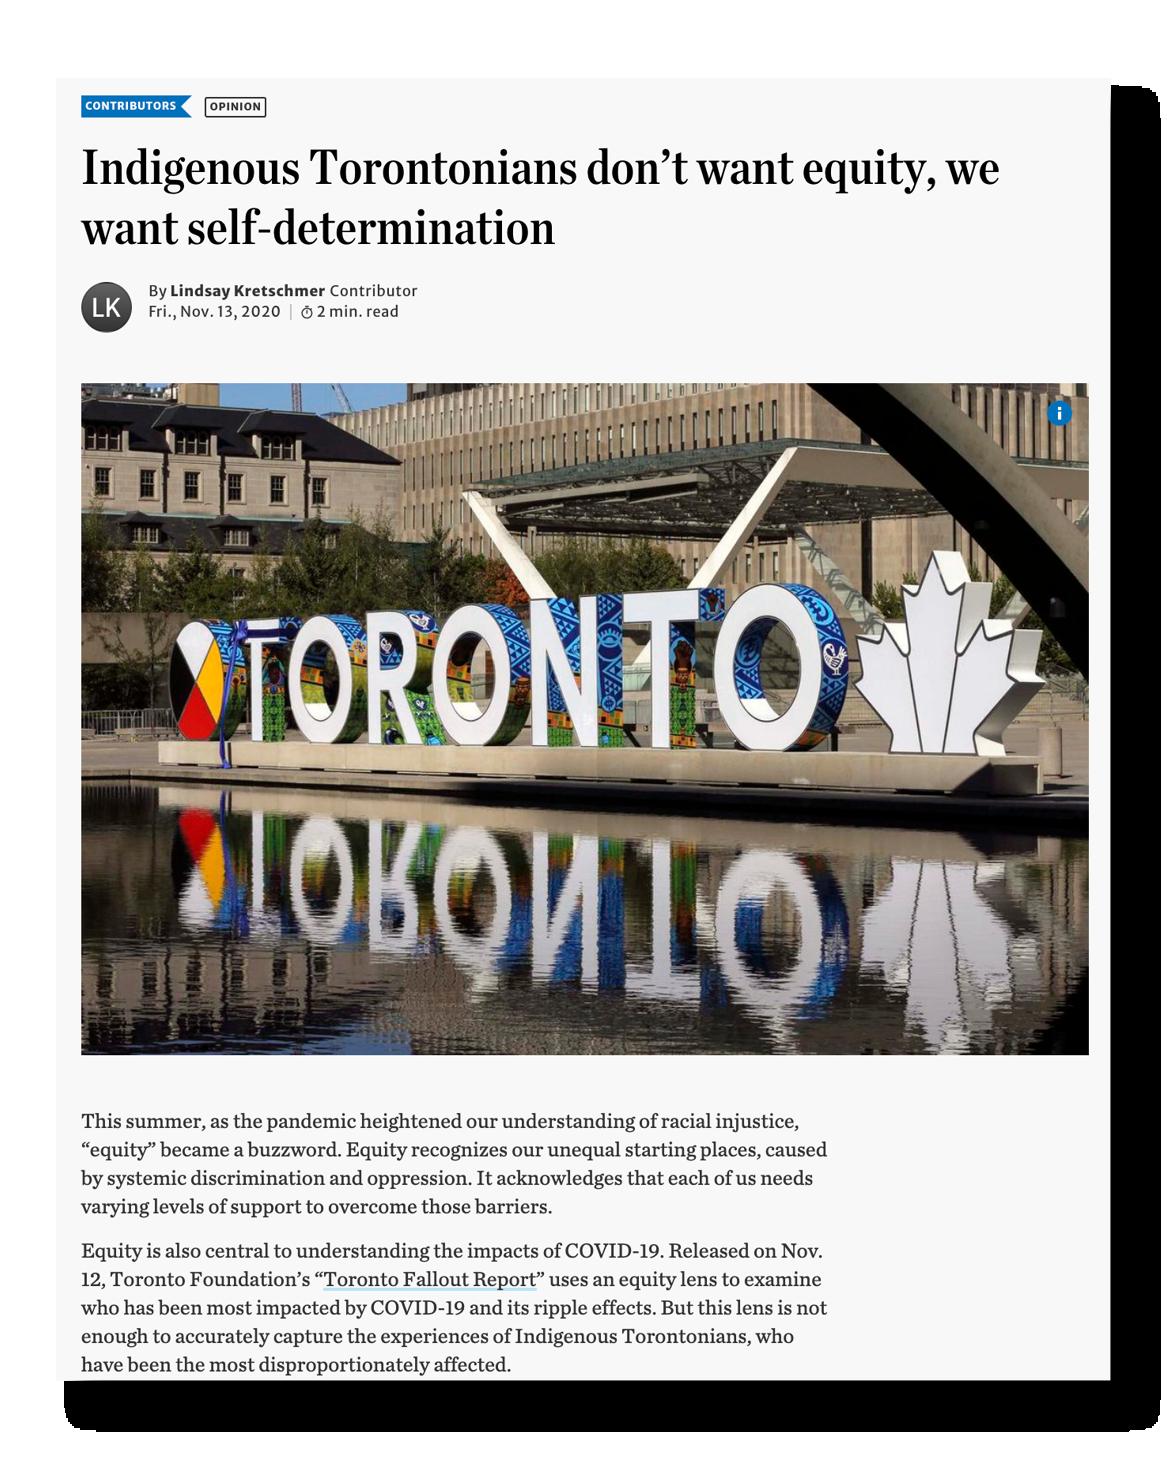 Toronto Star clipping 2